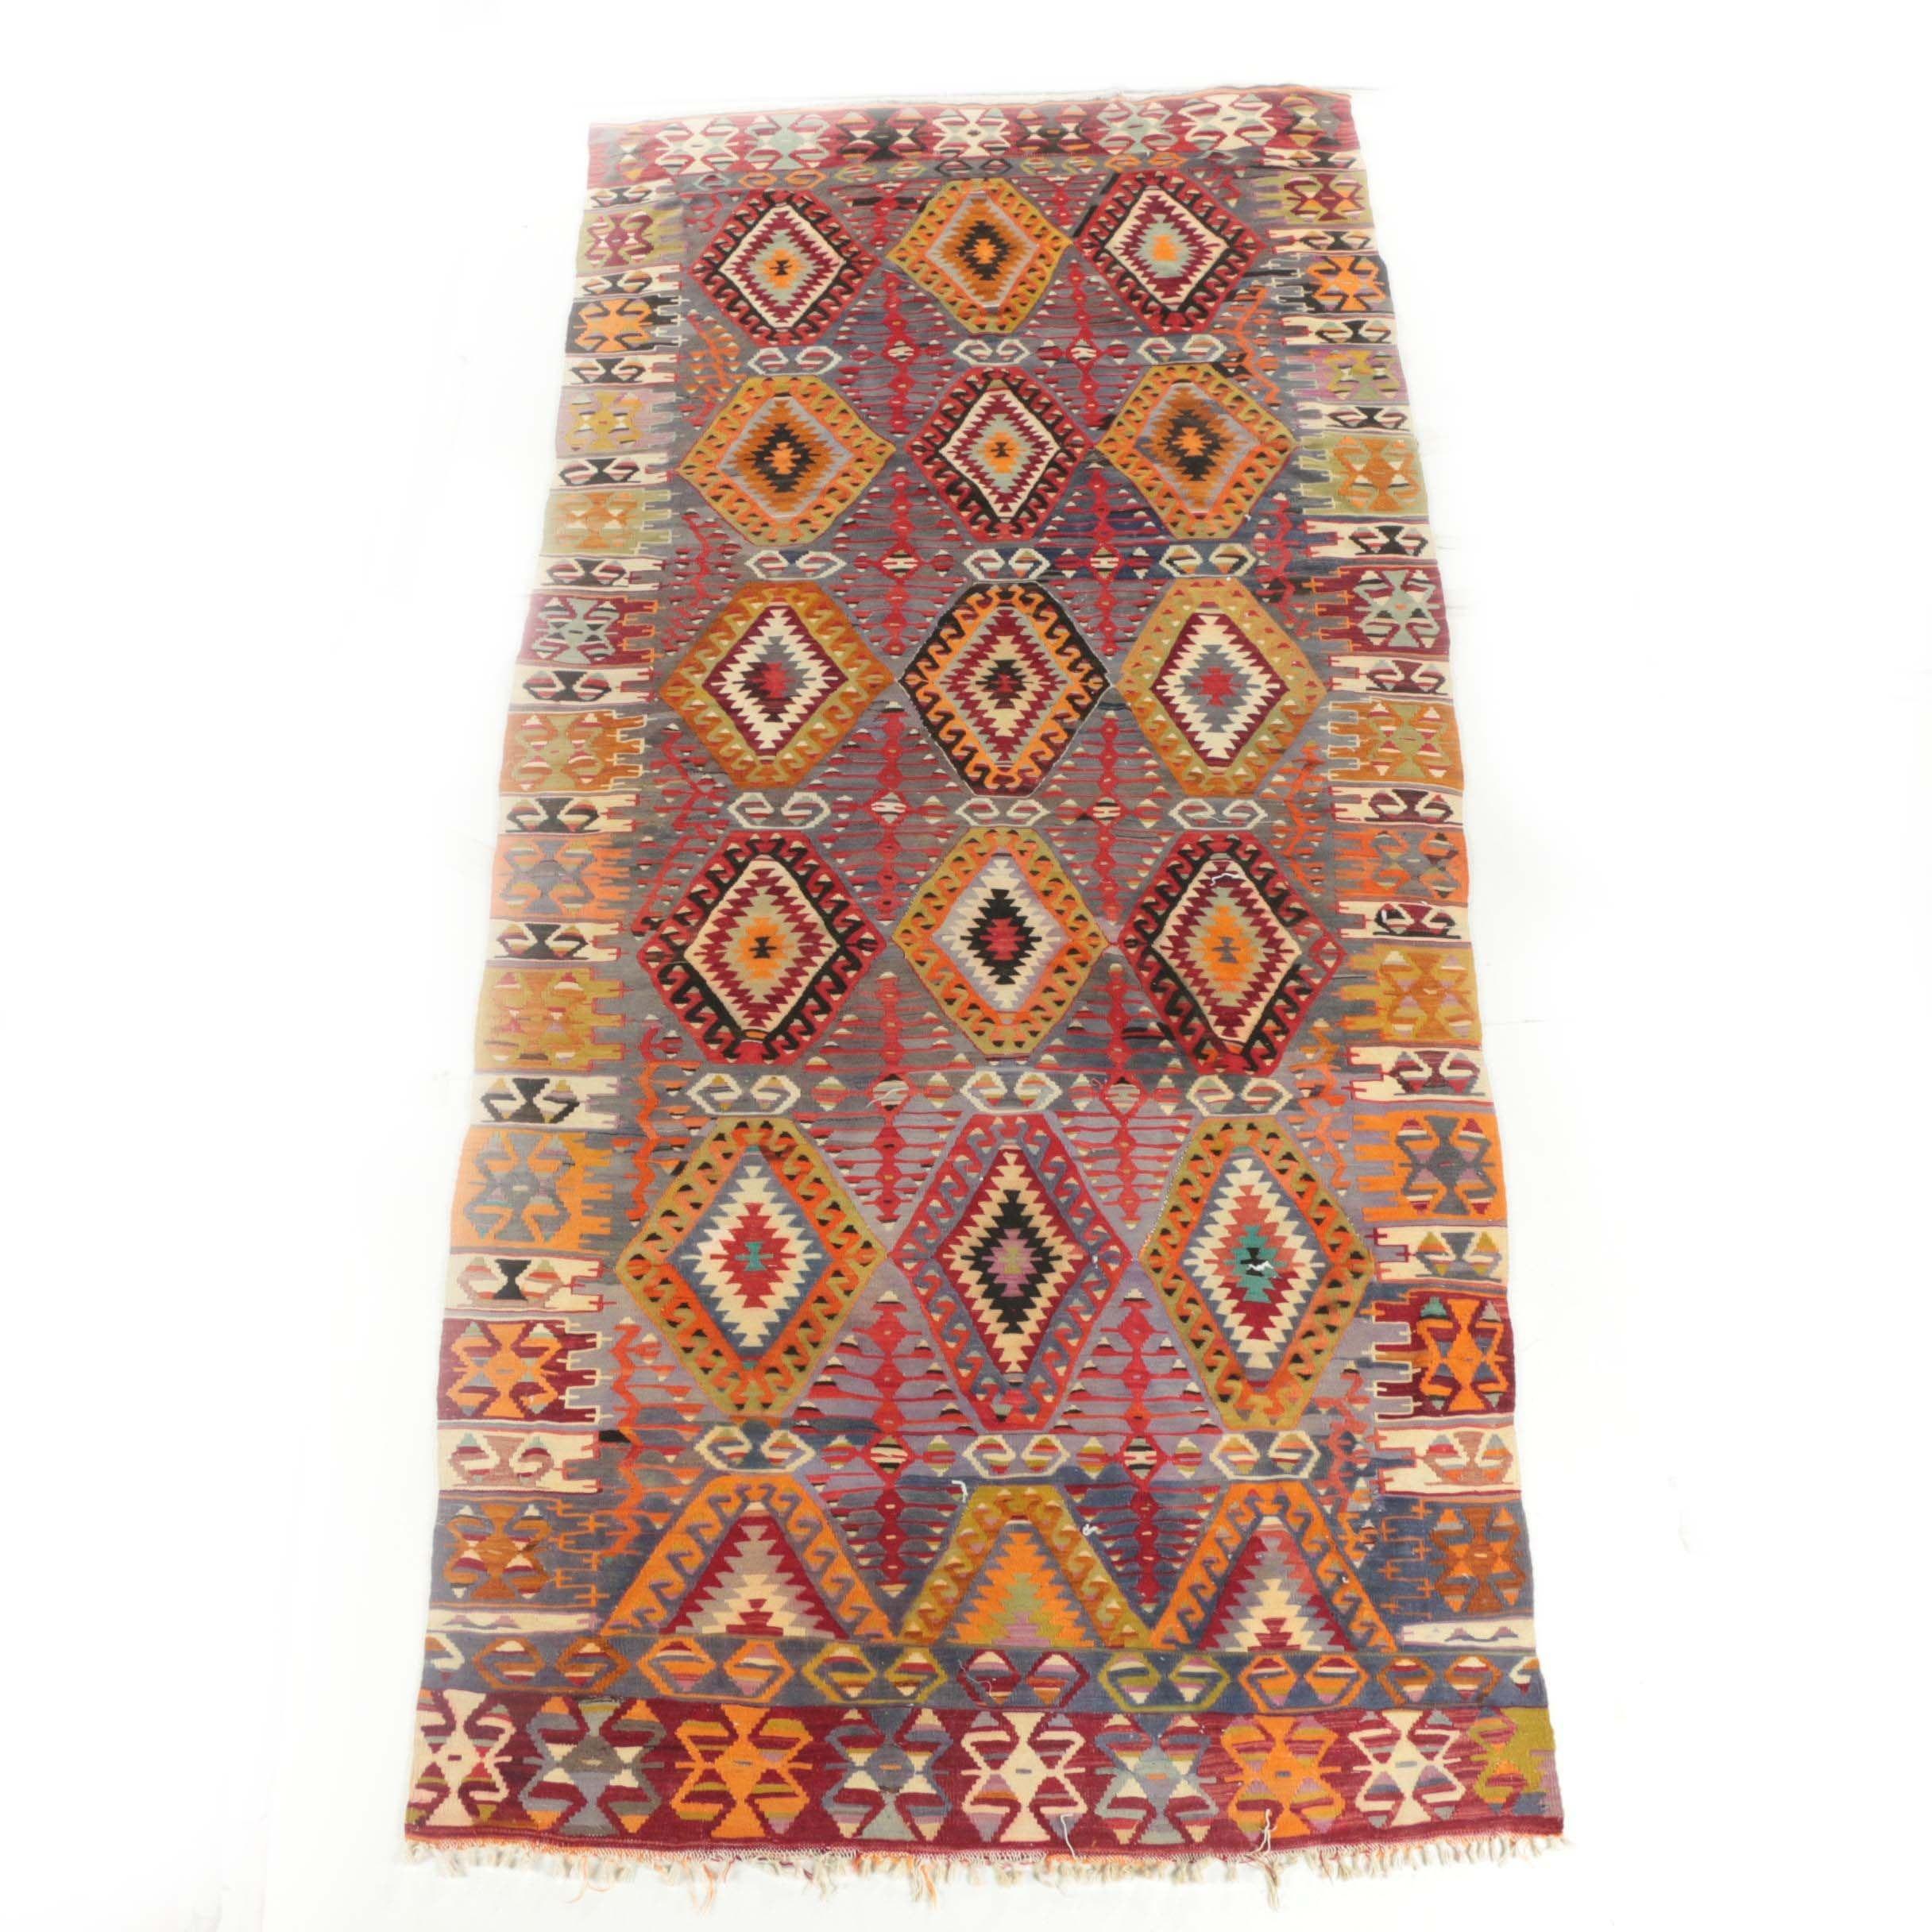 Handwoven Anatolian Wool Kilim